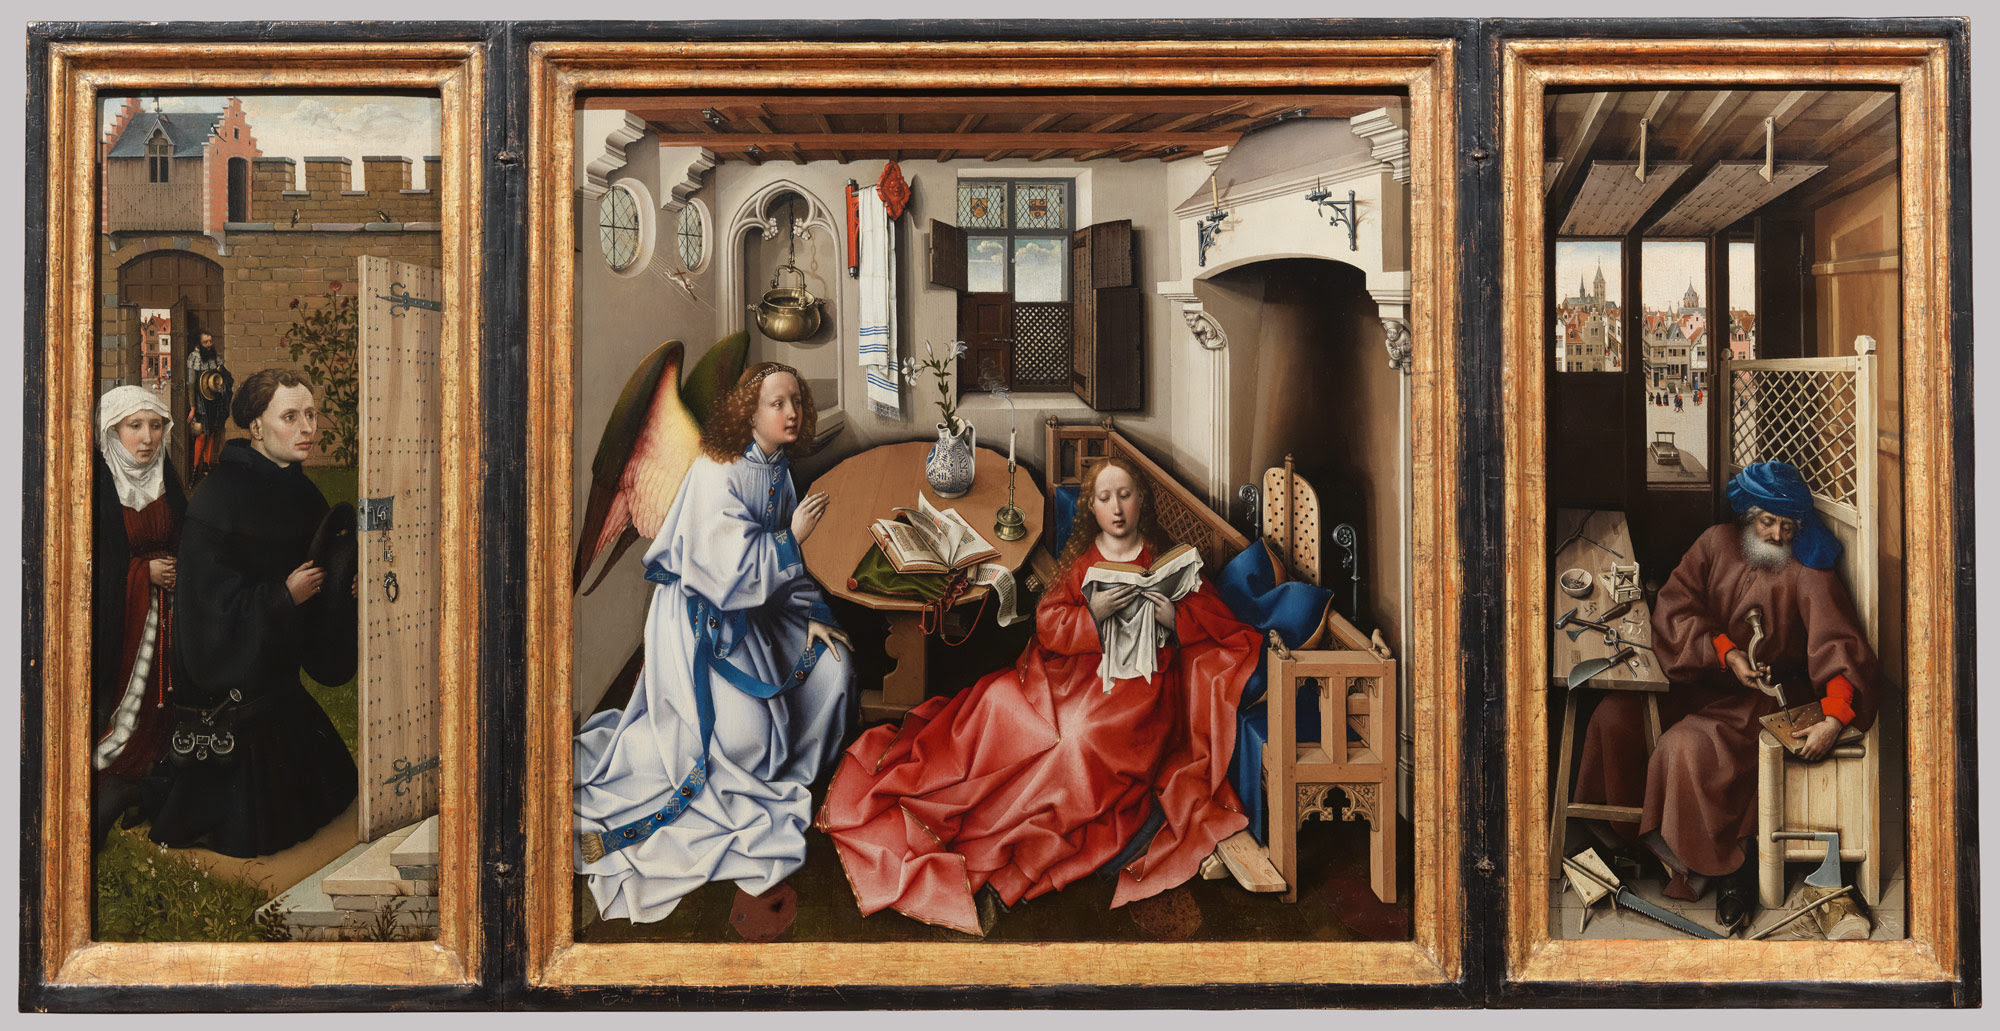 http://www.metmuseum.org/toah/images/hb/hb_56.70.jpg